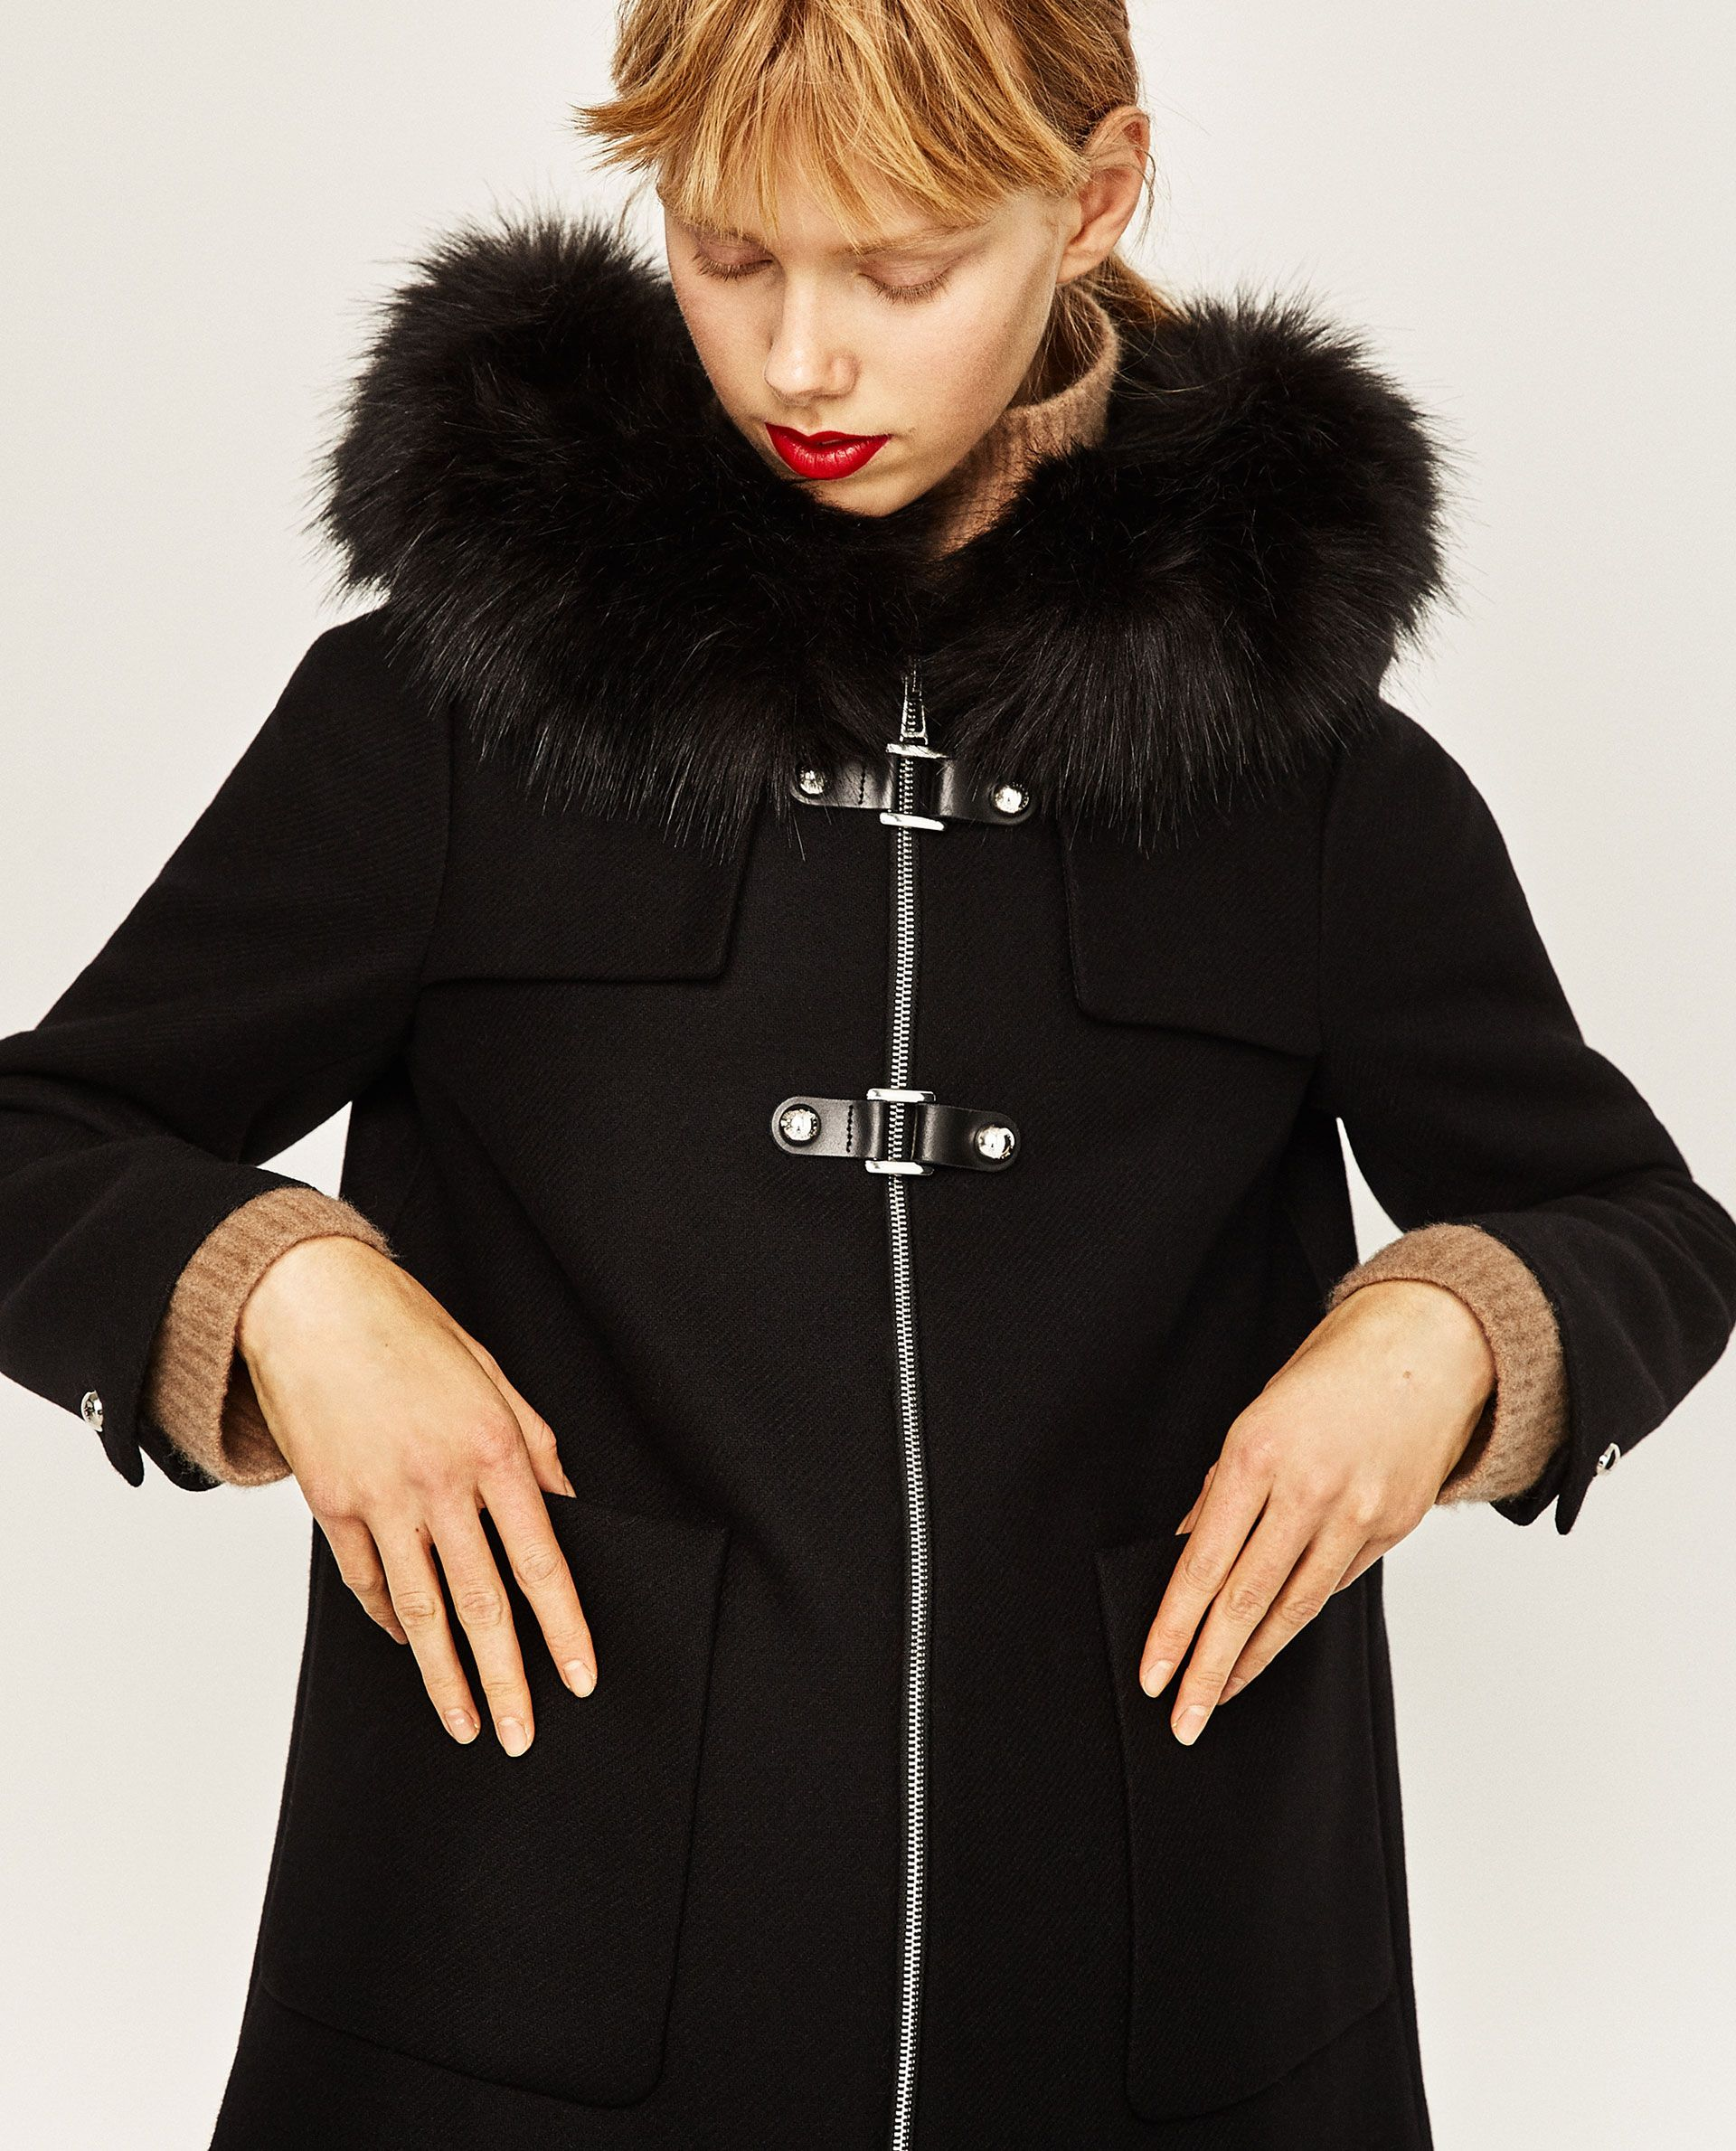 888fbdc018 A-LINE DUFFLE COAT | outerwear | Duffle coat, Coat, Outerwear women